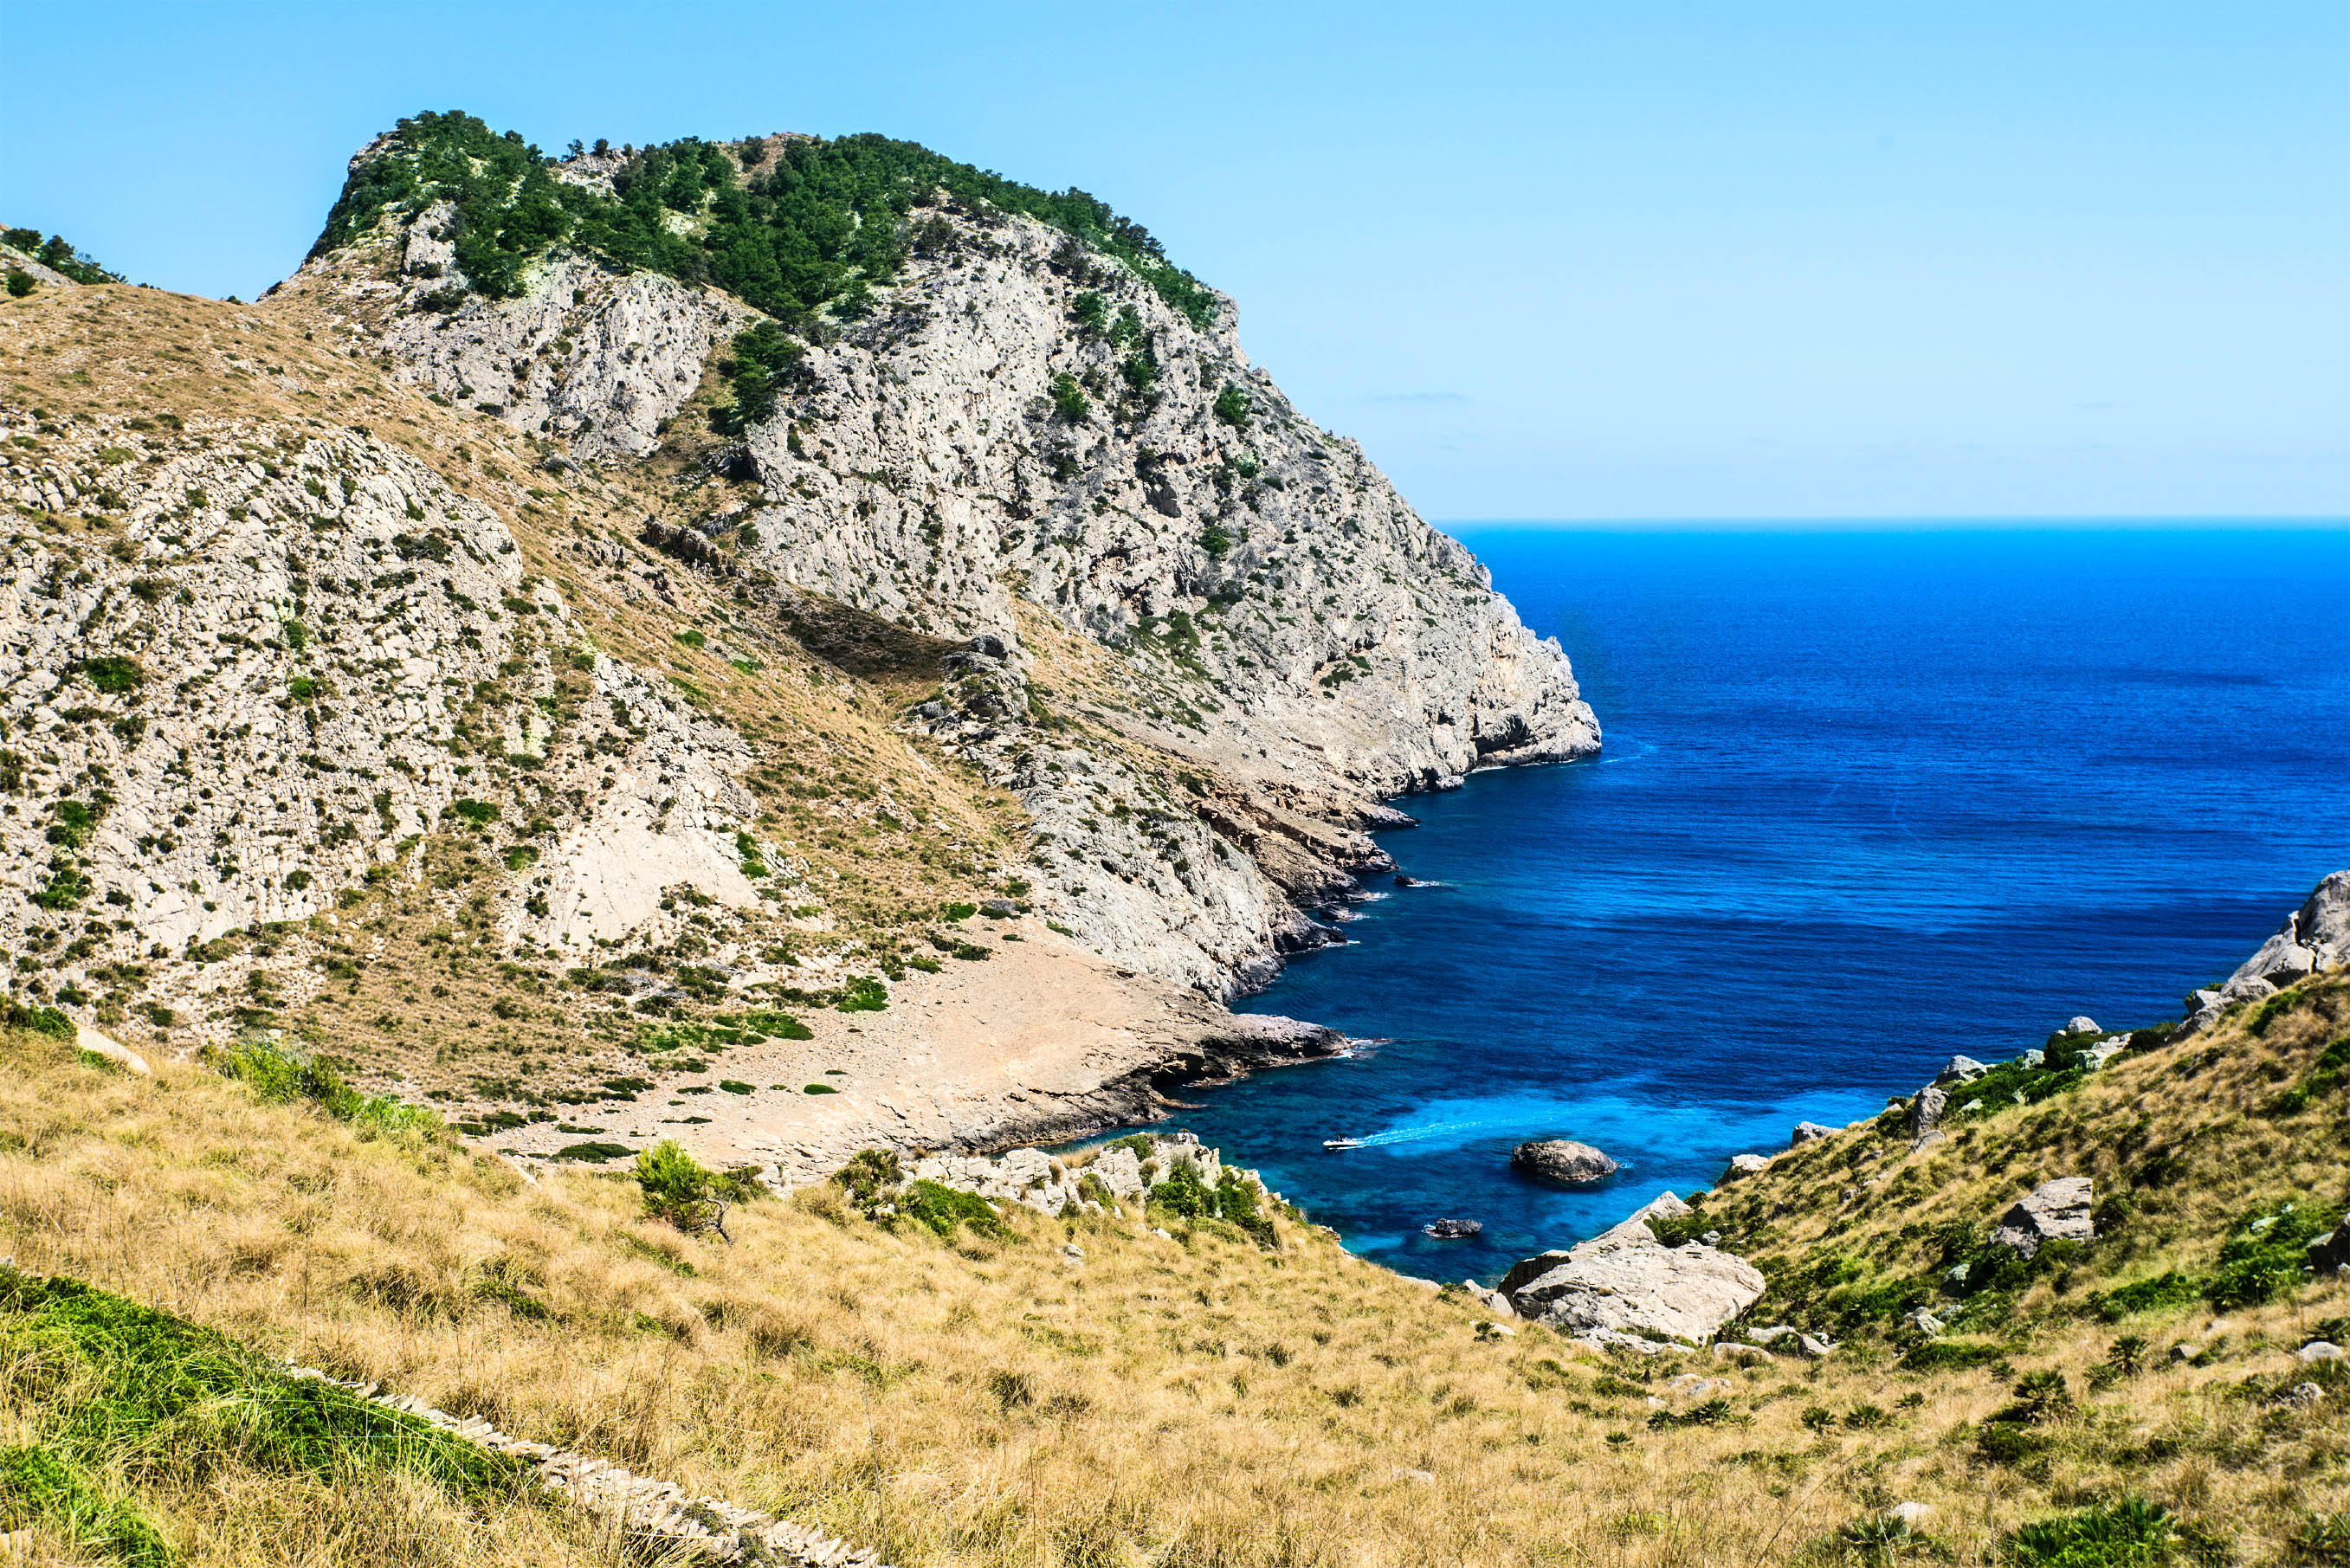 Het mooie strand Cala Figuera op Mallorca